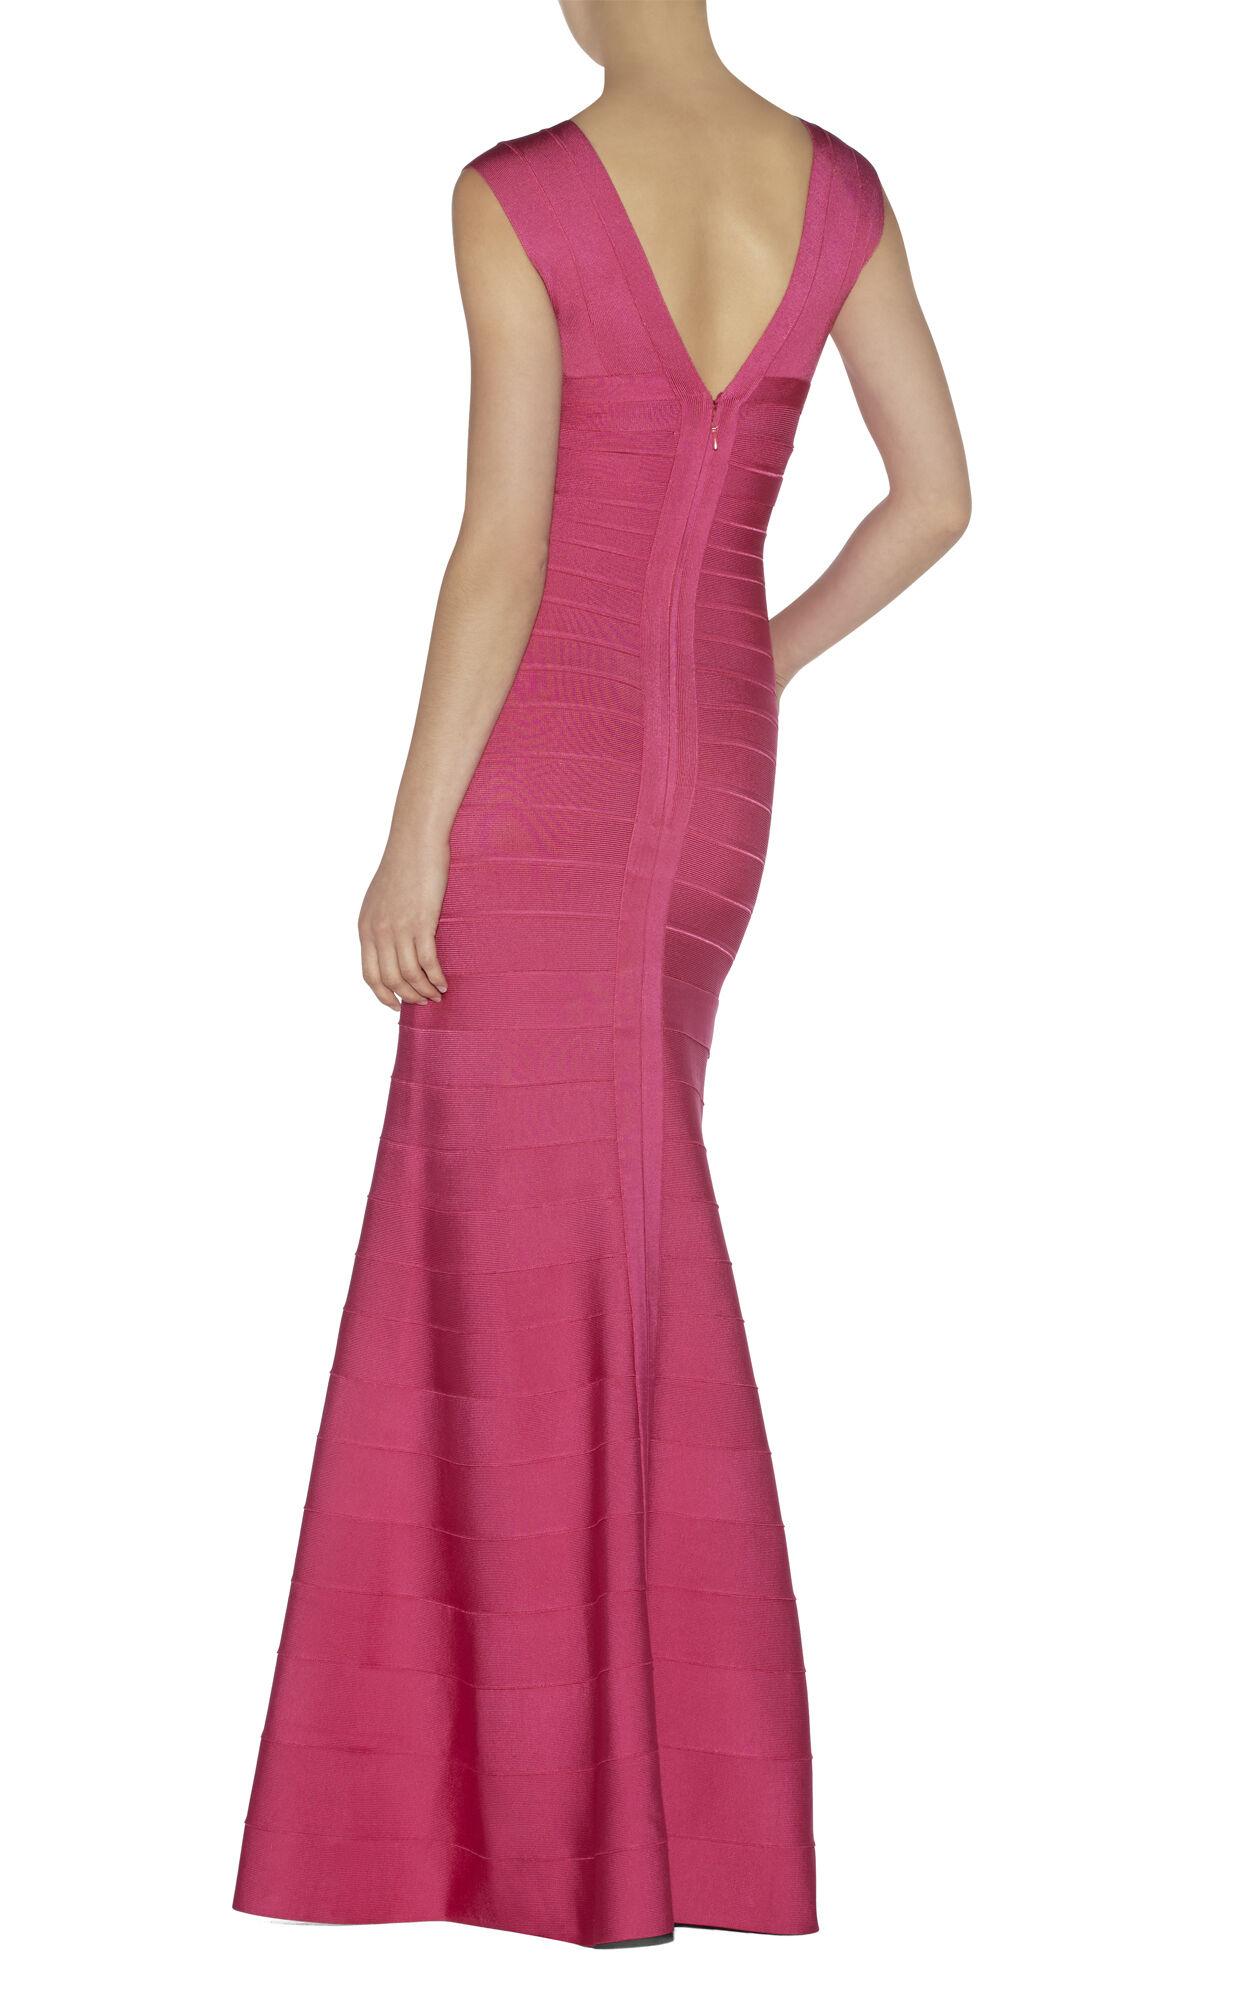 Gracie Signature Essential Dress